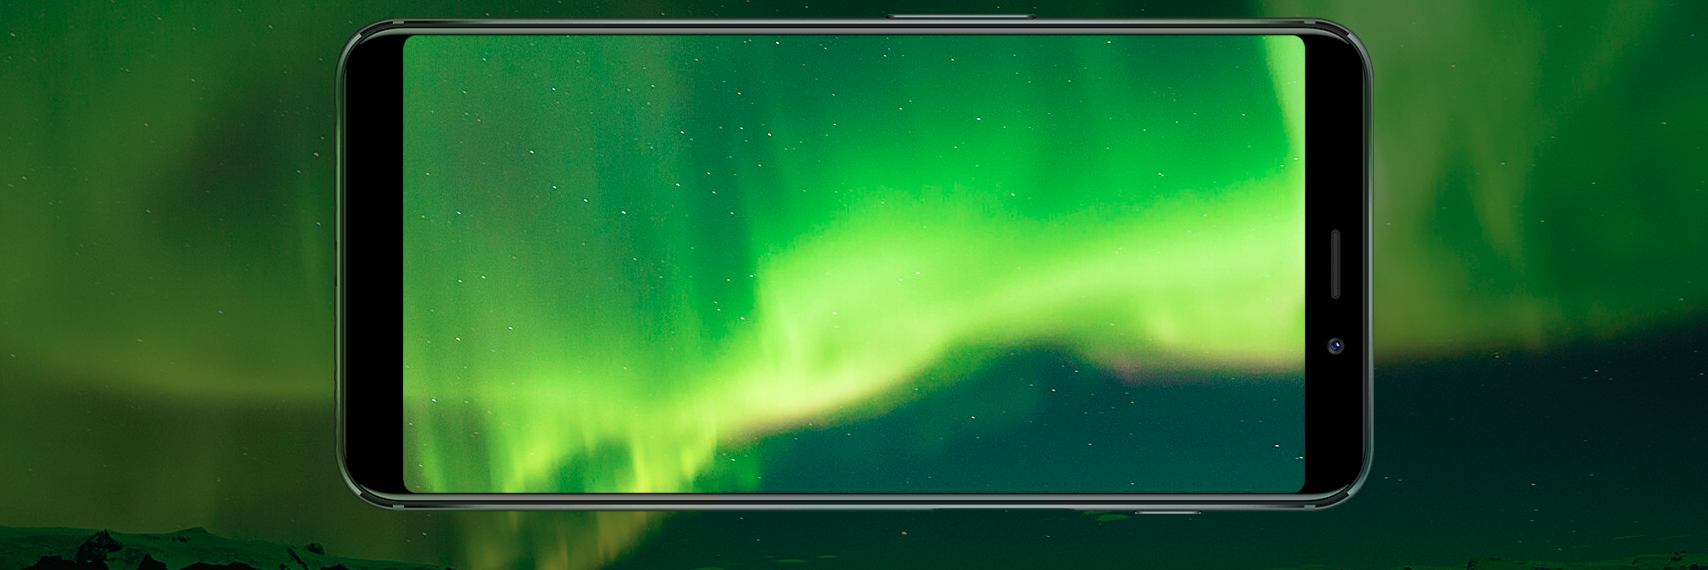 Meizu M6S edge to edge Display